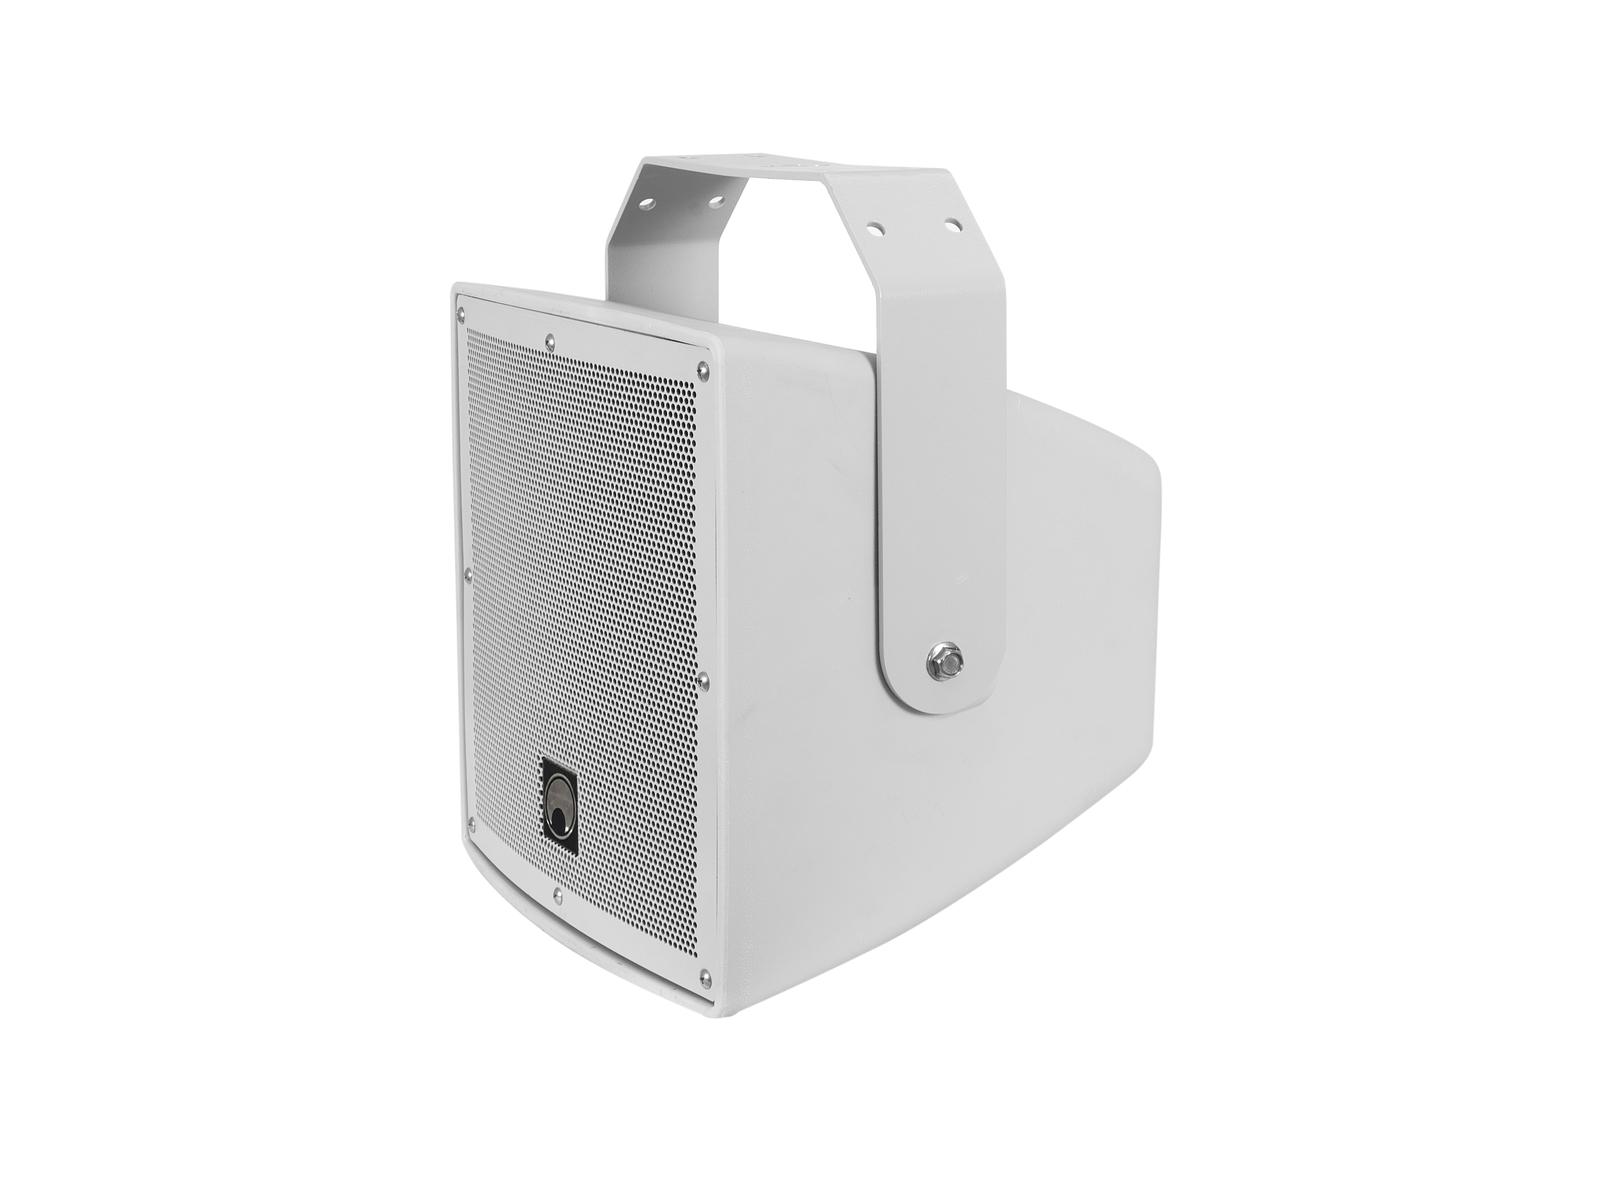 OMNITRONIC ODX-208T Installationslautsprecher 100V weiß